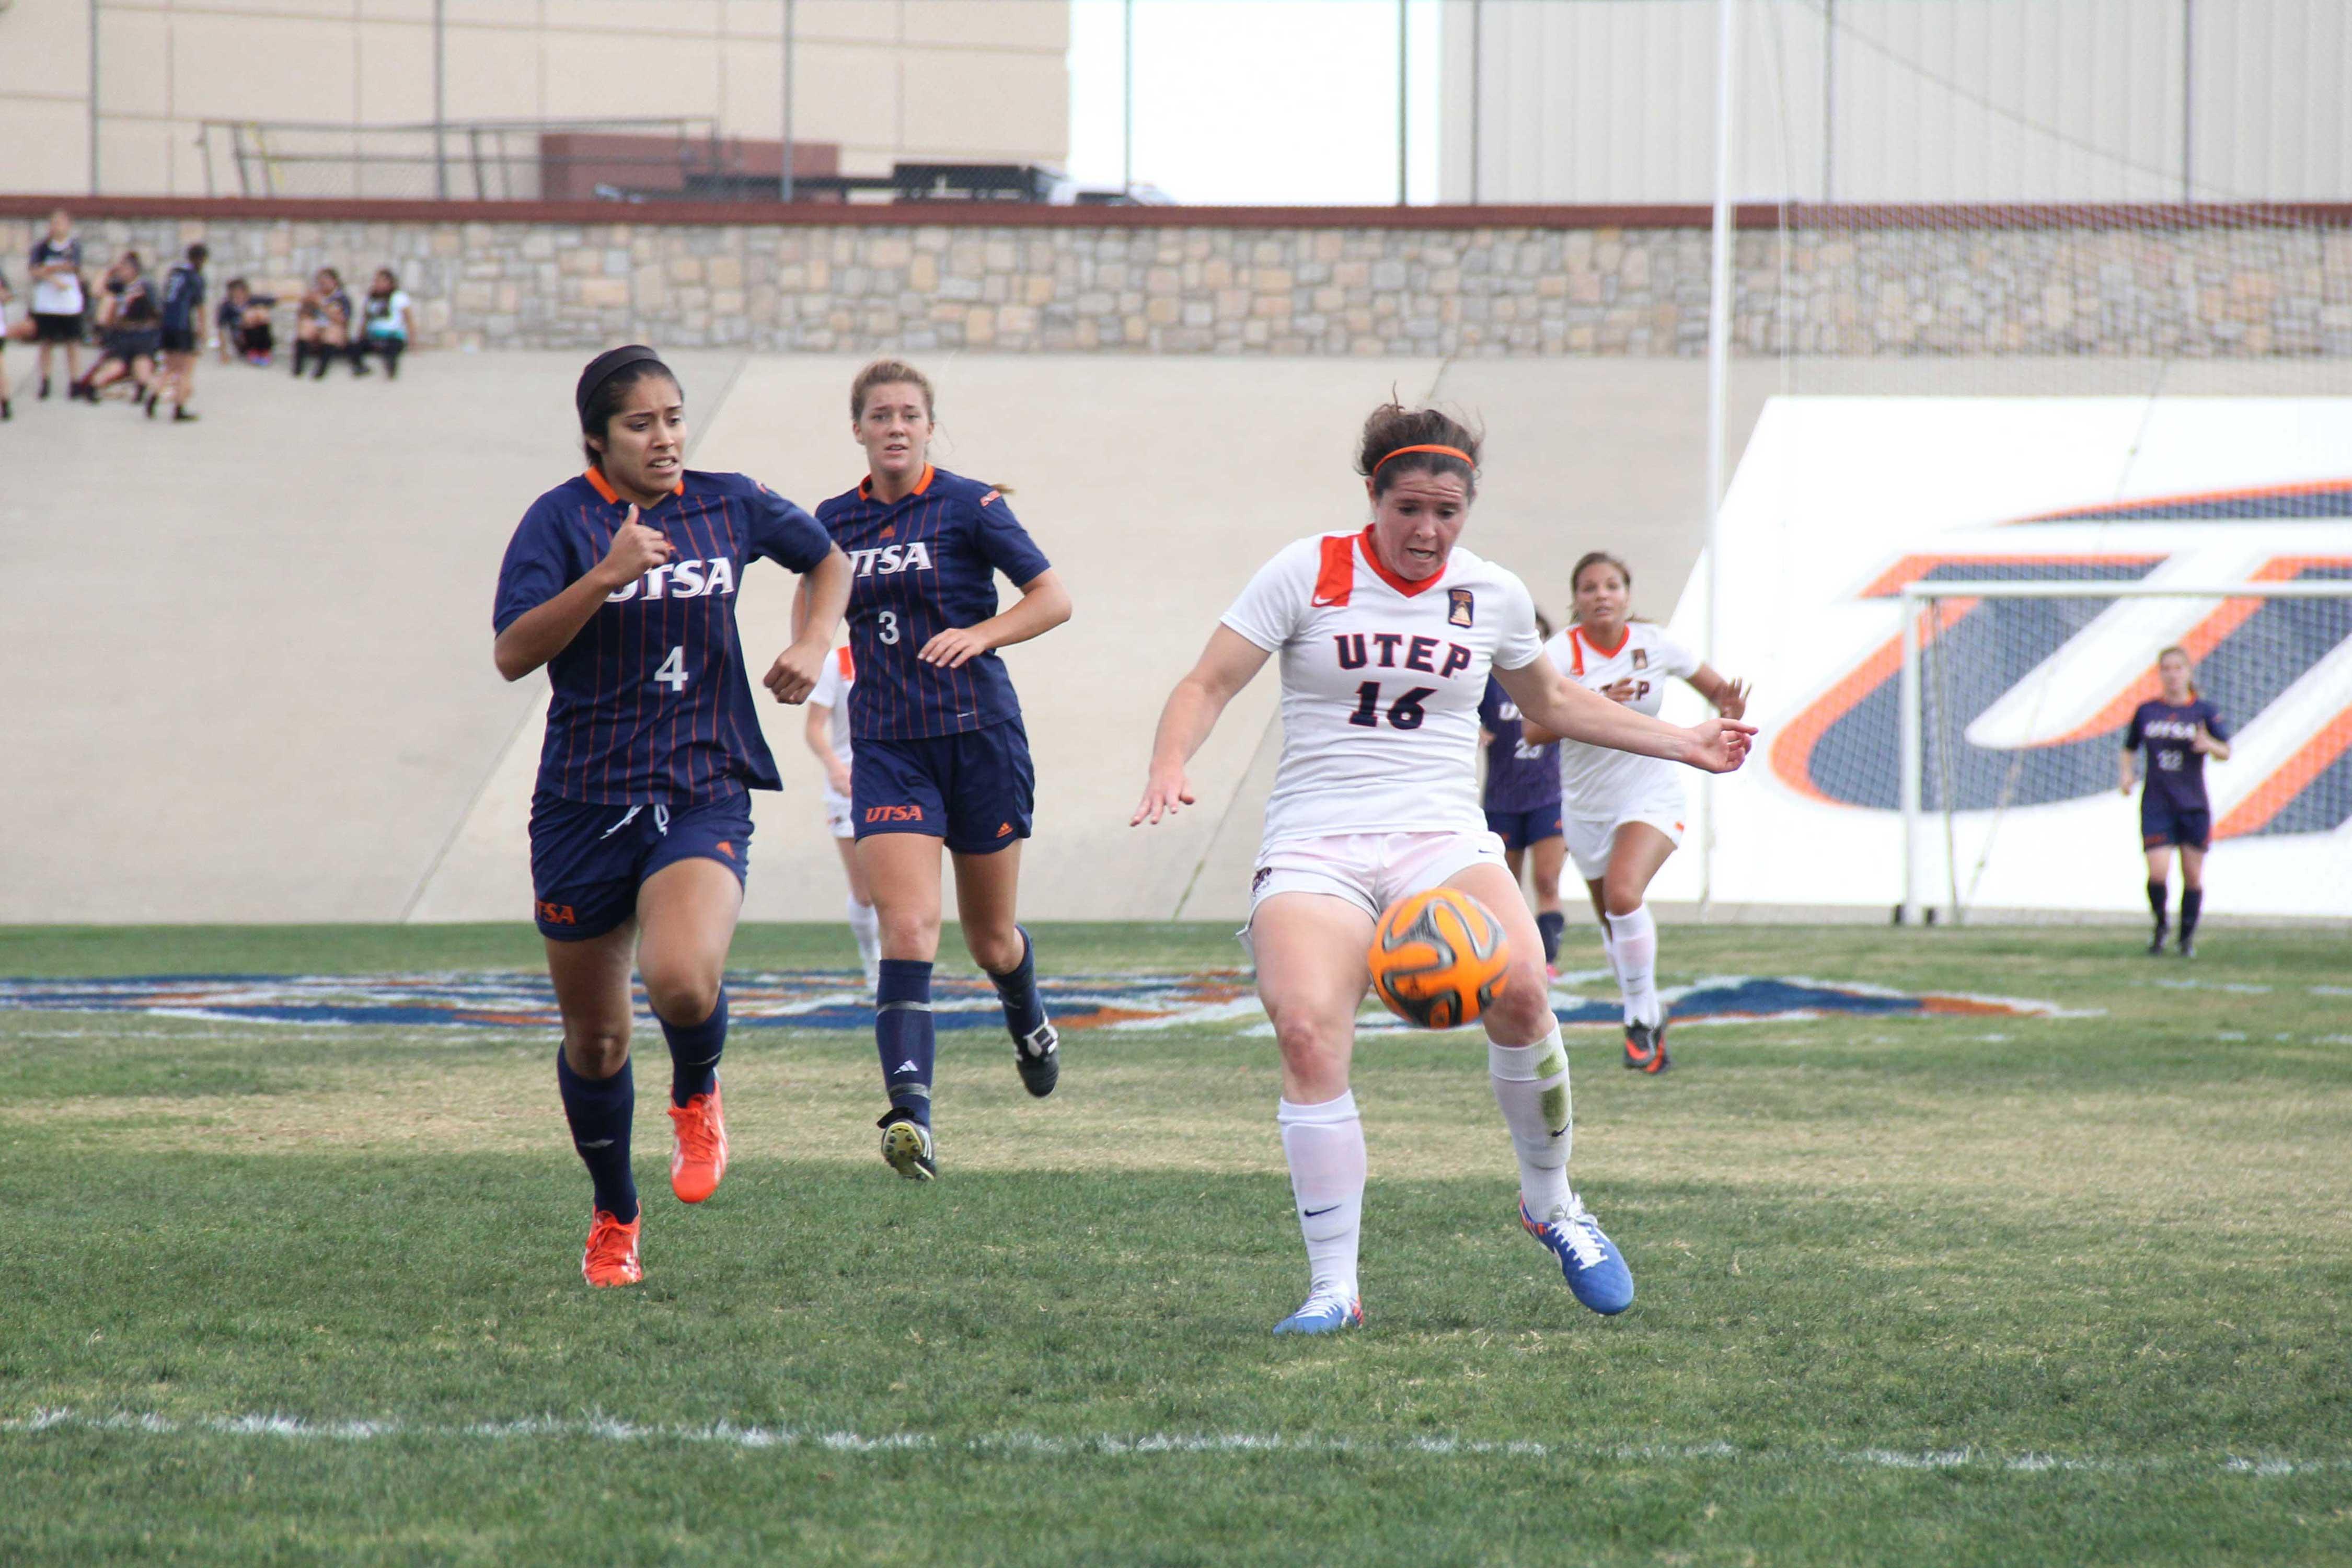 Freshman striker Sarah Mullen prepares to score the second goal of the match